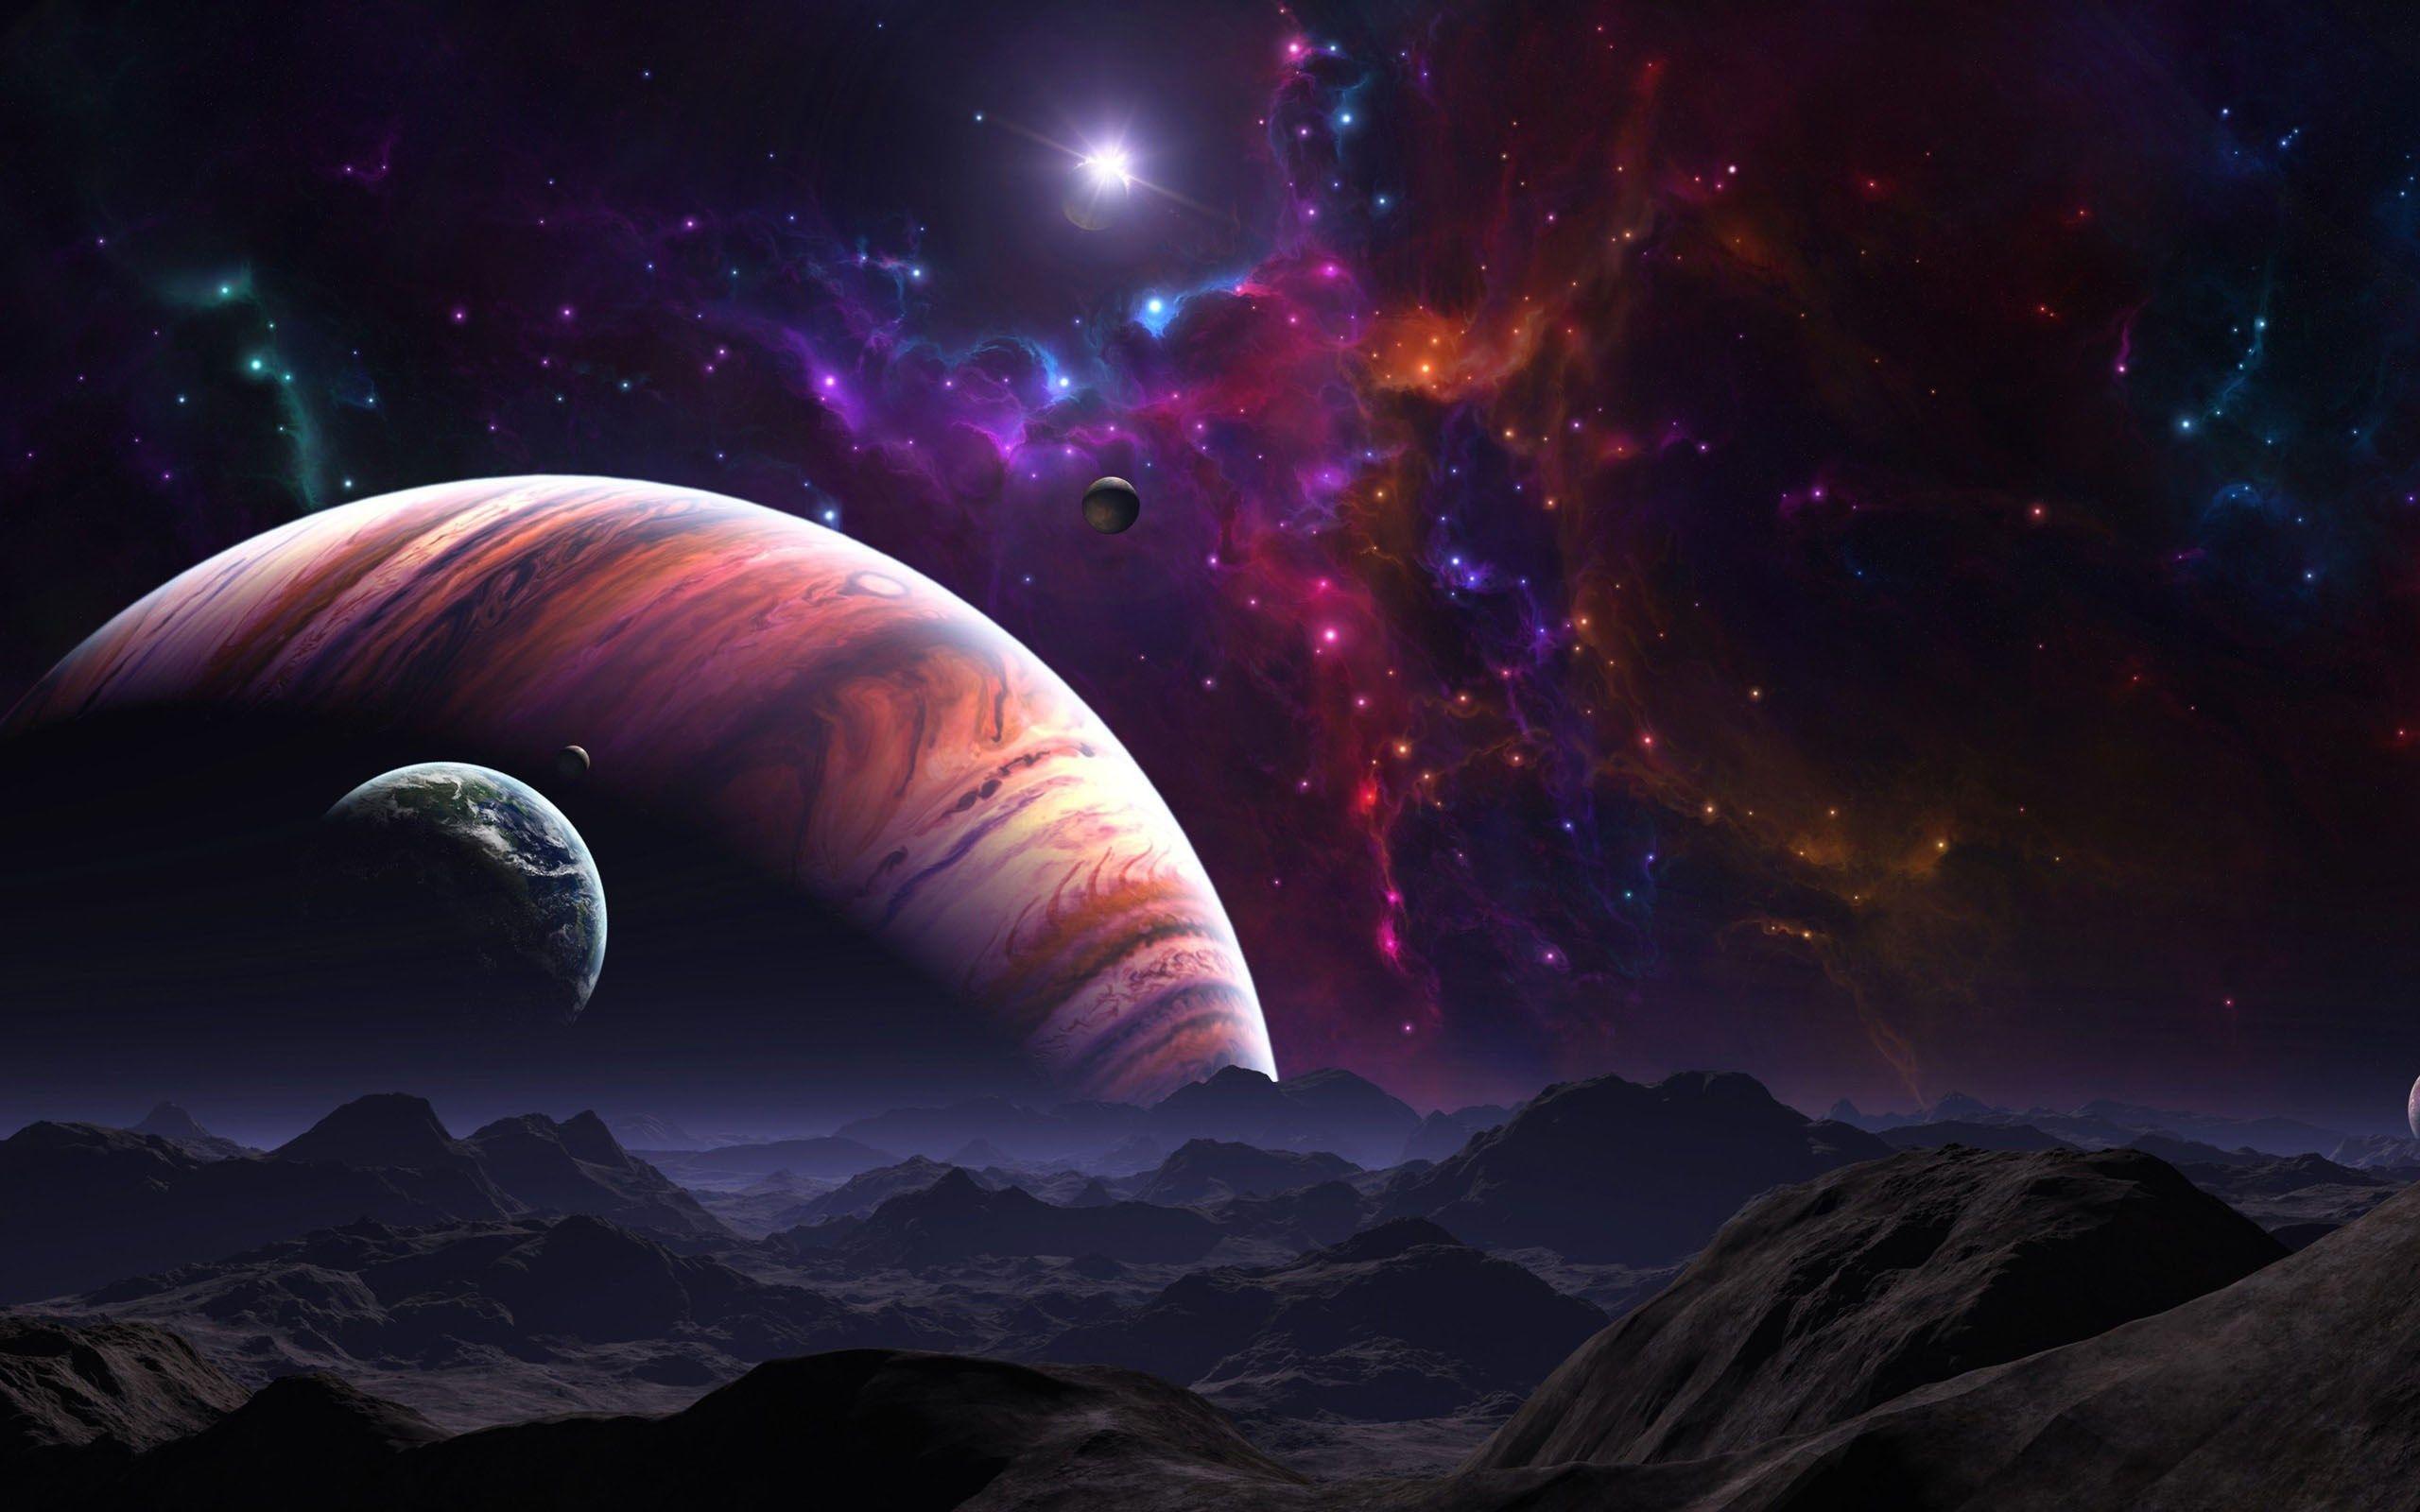 Galaxy In Sky Full Hd Wallpaper Engine Free Full Hd Wallpaper Hd Wallpaper Sky Full